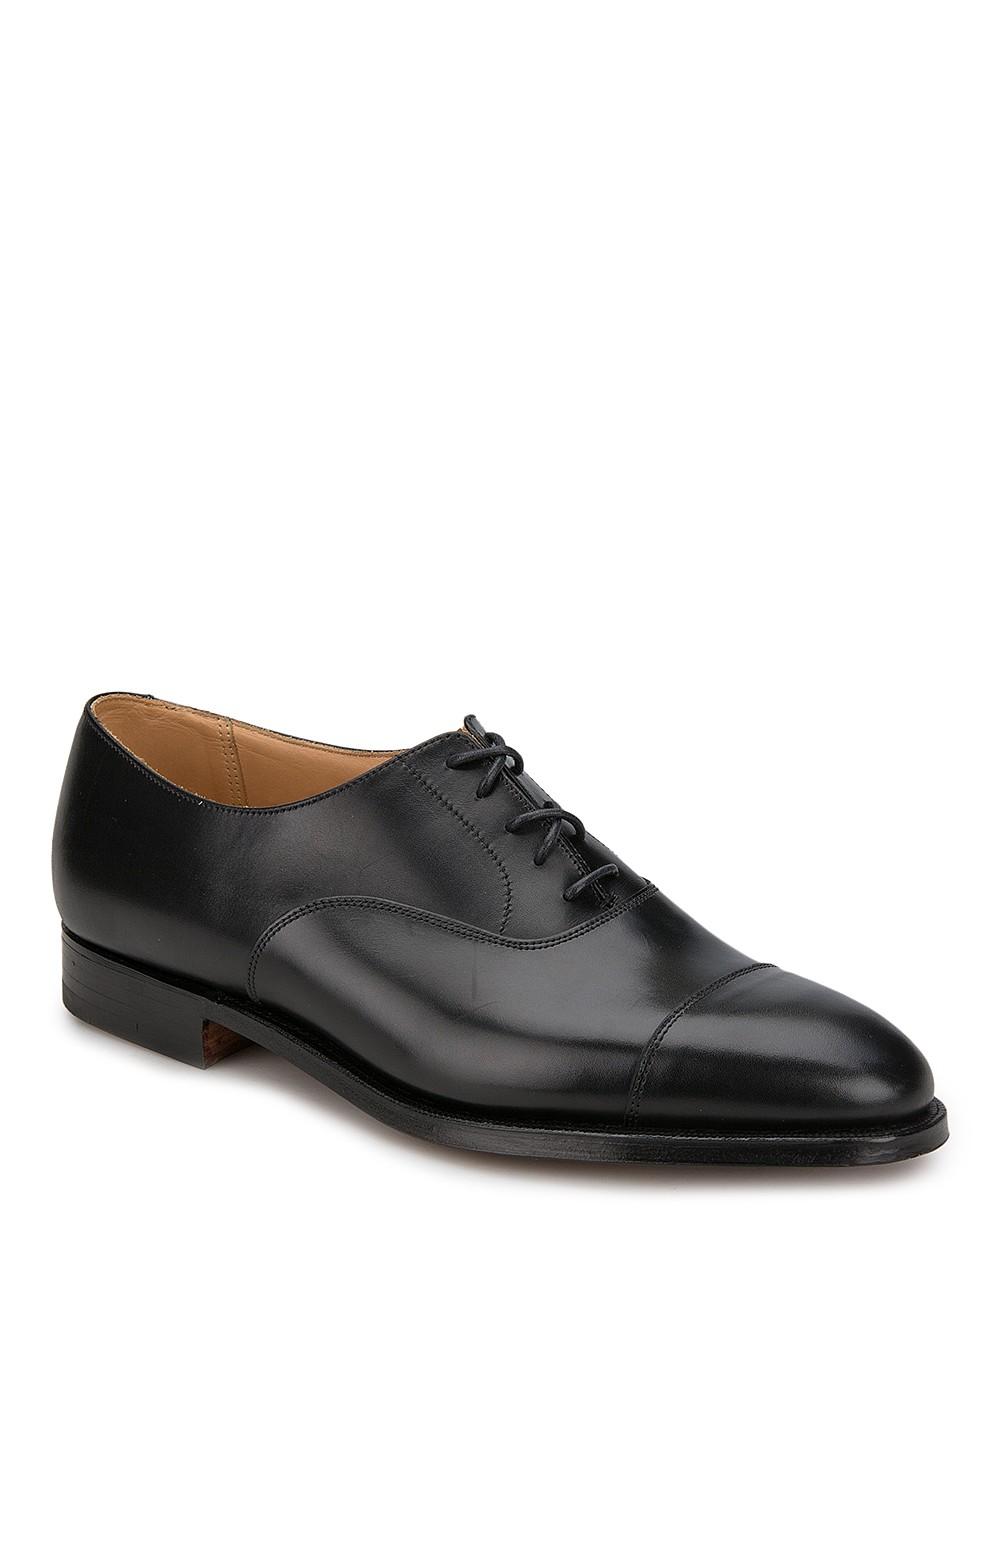 house of bruar mens shoes